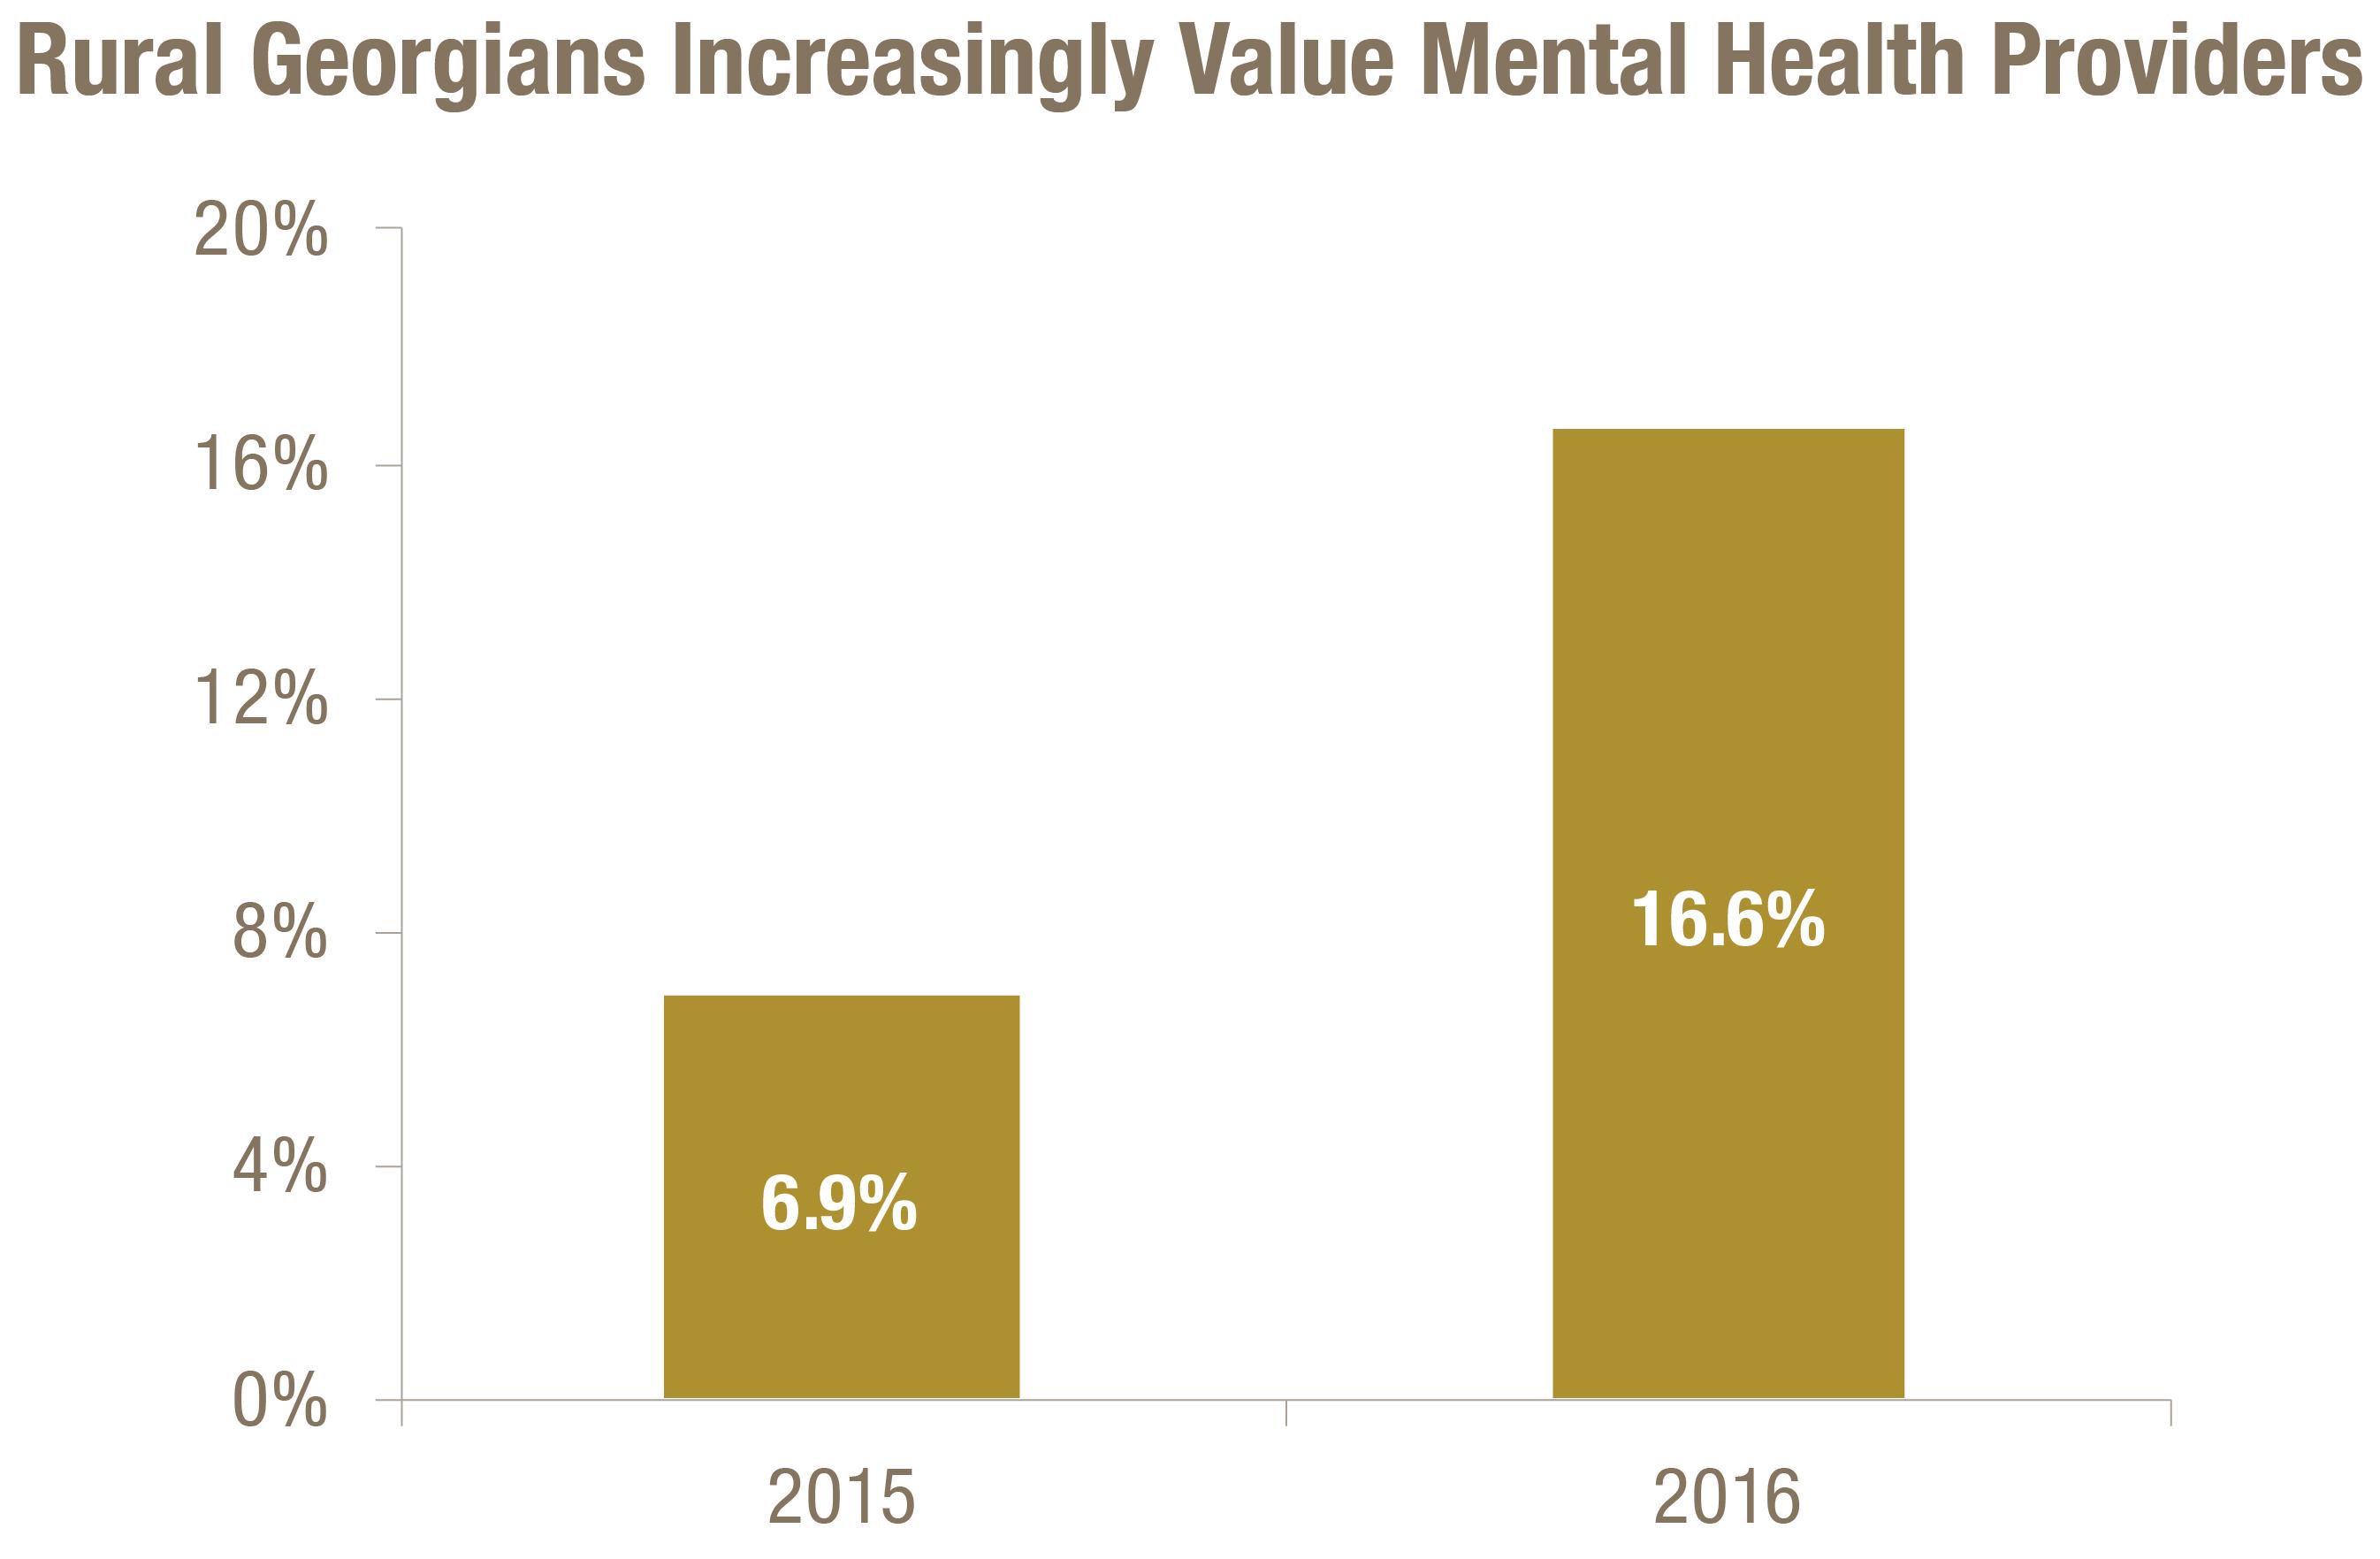 Asian mental health providers